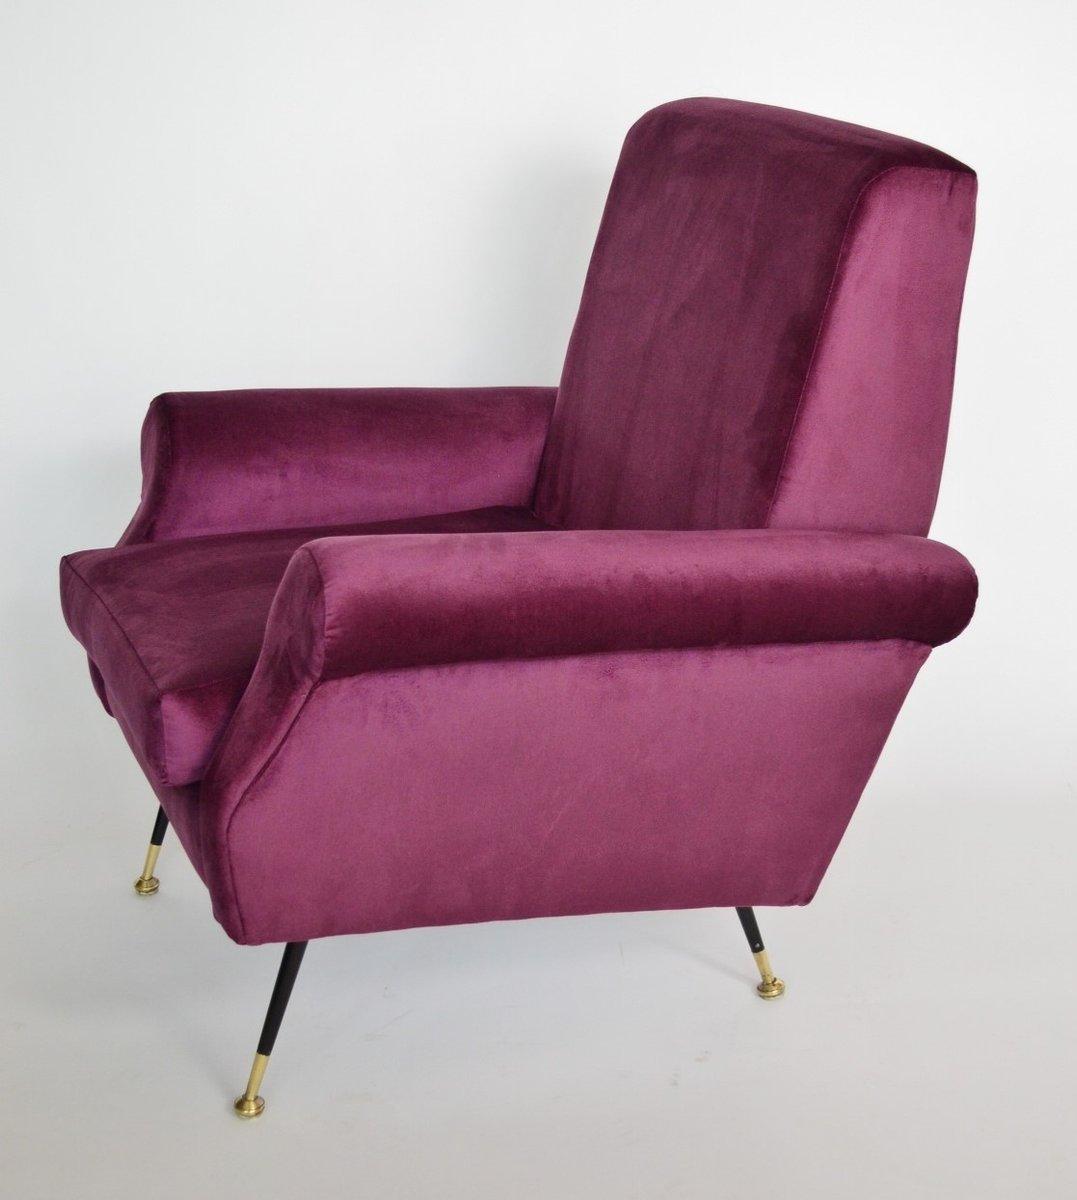 italienische lila sessel aus samt messing 1950er 2er set bei pamono kaufen. Black Bedroom Furniture Sets. Home Design Ideas